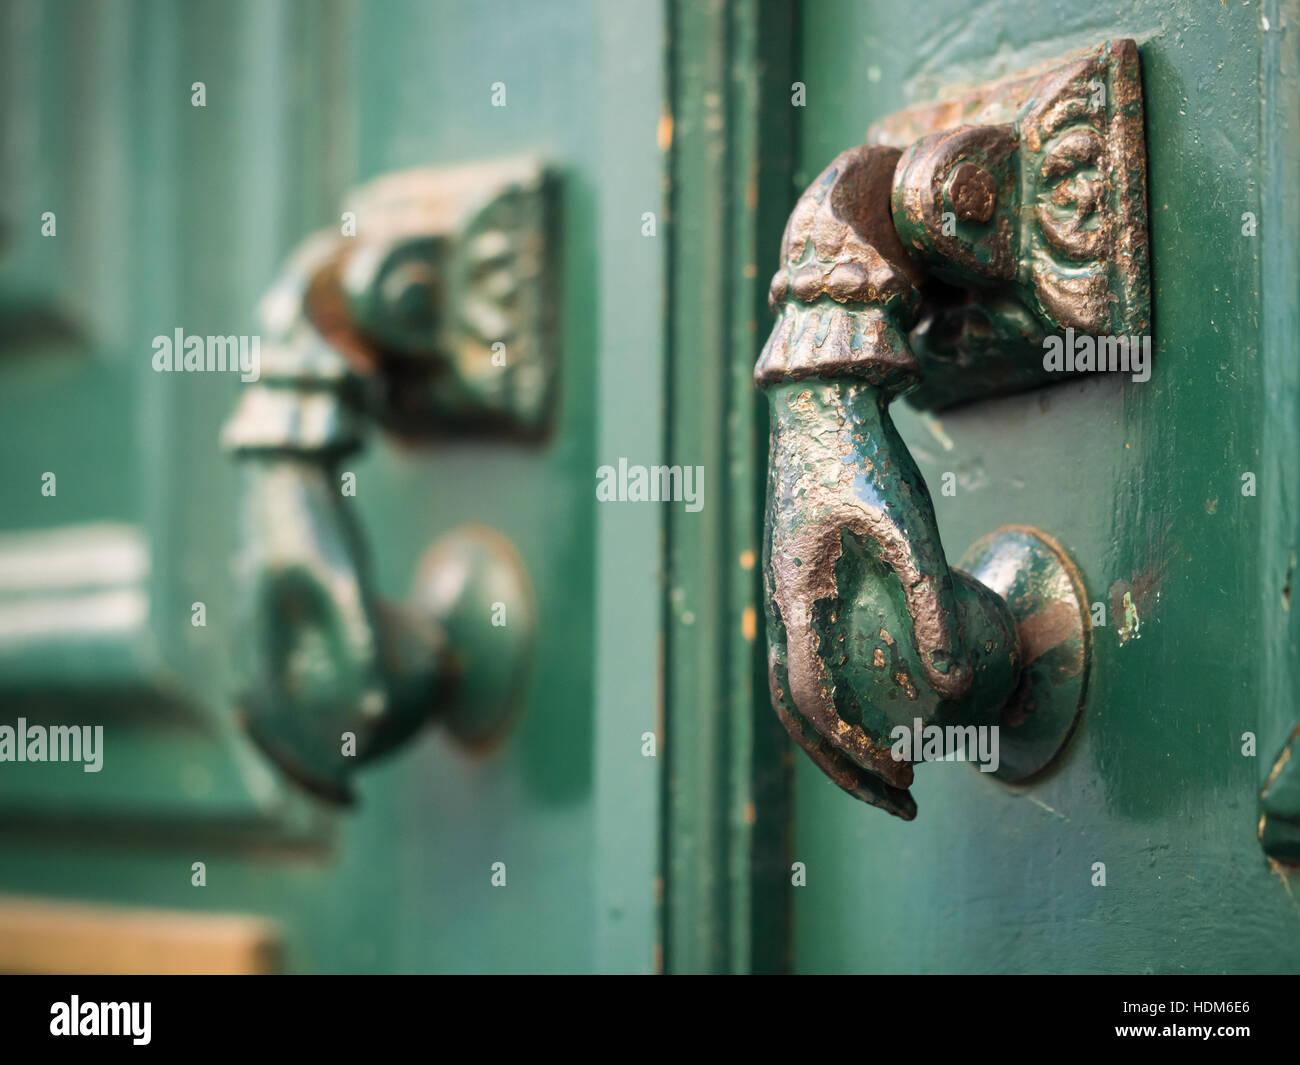 Old hand shaped metal door handles in Bairro Alto, Lisbon, Portugal - Stock Image